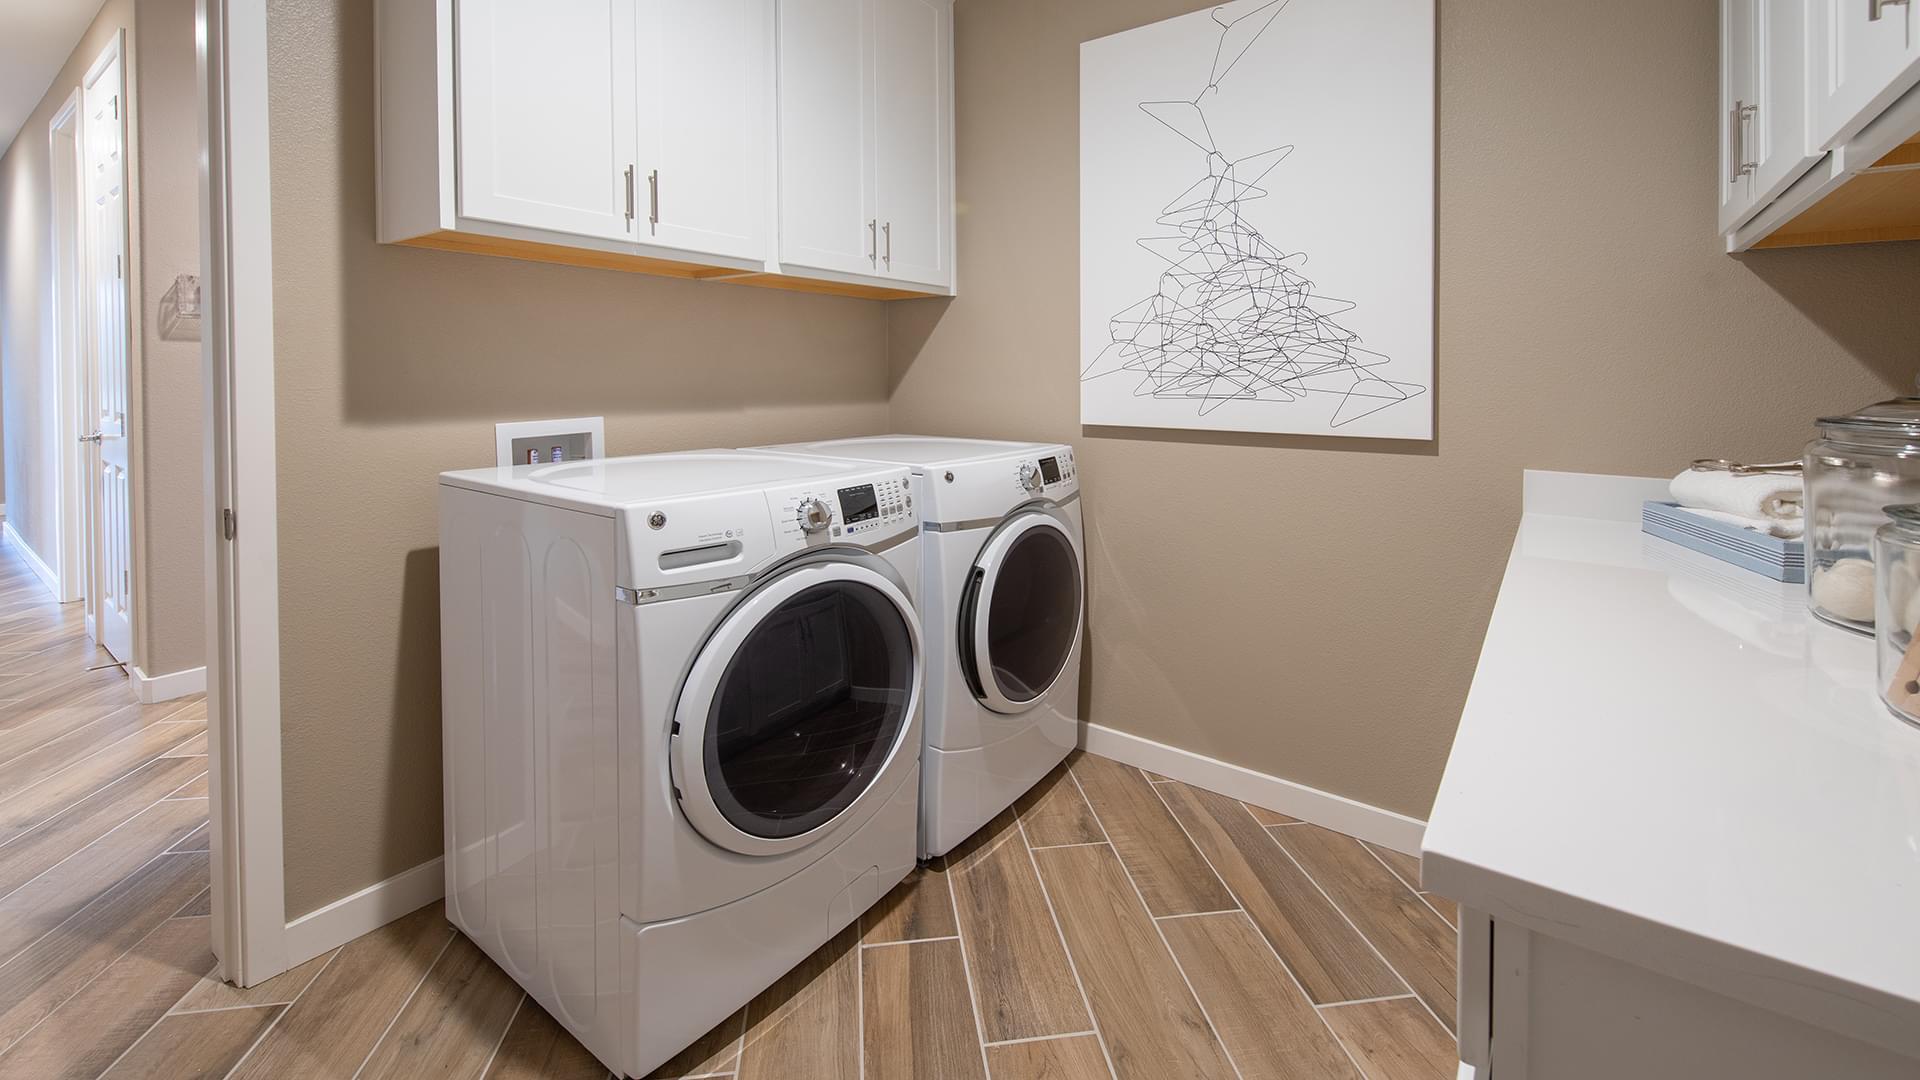 Residence 3 Laundry Room